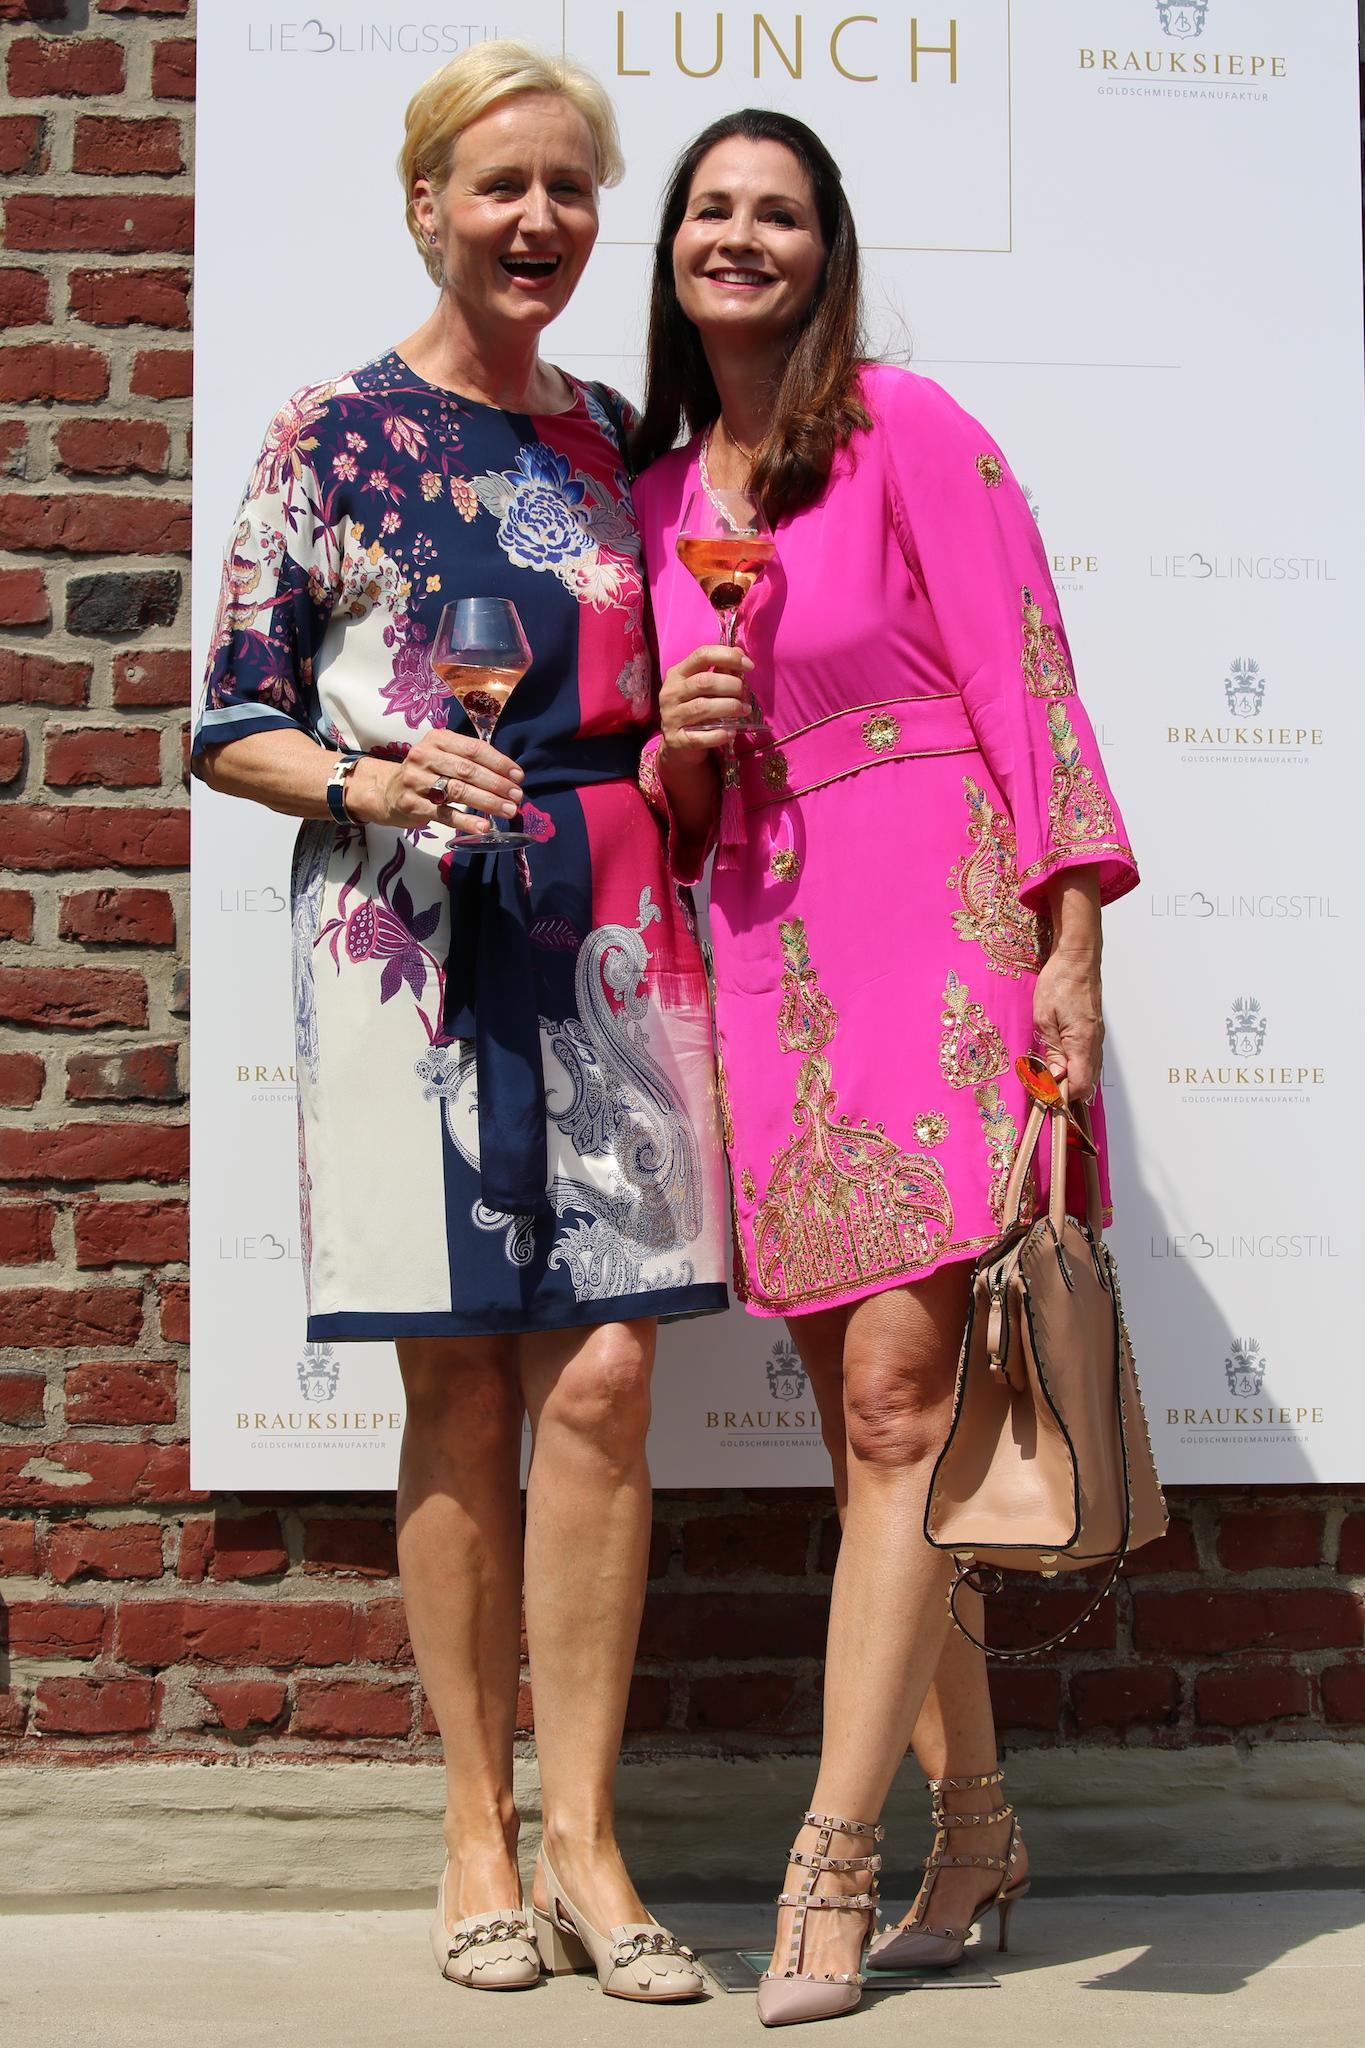 Marion Bock Galderma, Dr. Jutta Henscheid, Brauksiepe Ladies Lunch, Lifestyle-Blog, Lieblingsstil.com,